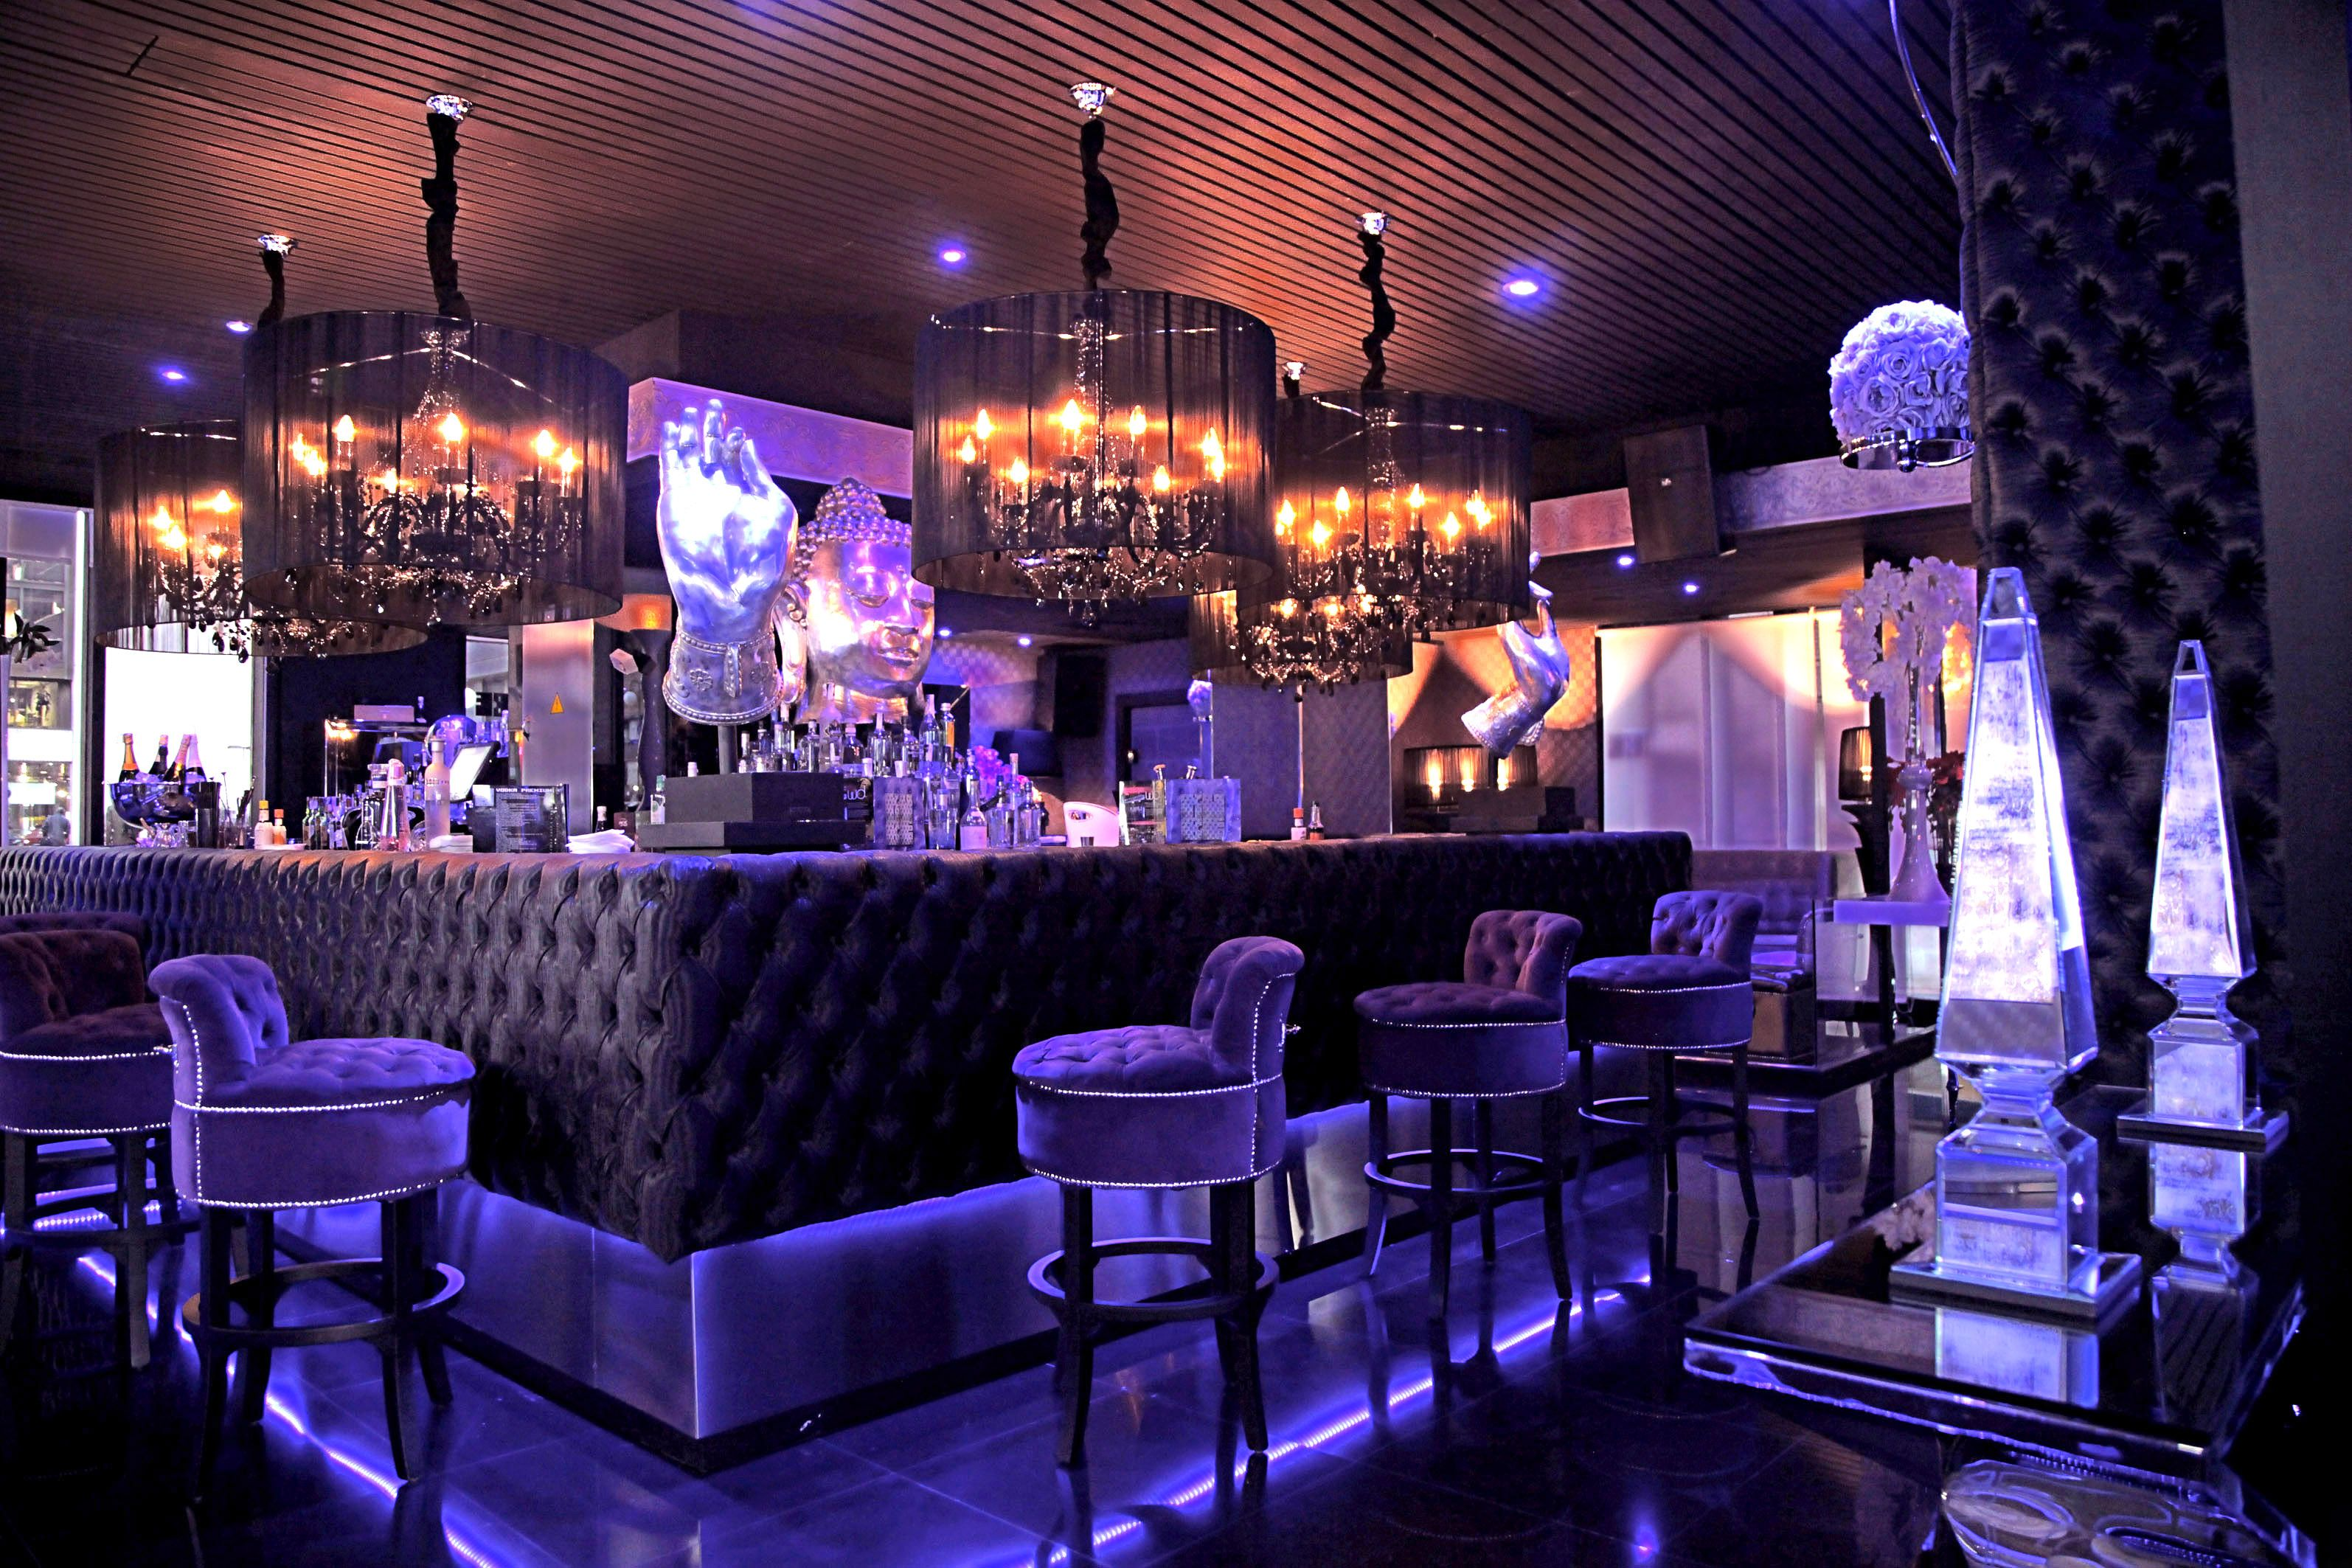 Newwd decoracion de bares tematicos kube madrid for Decoracion bares tematicos